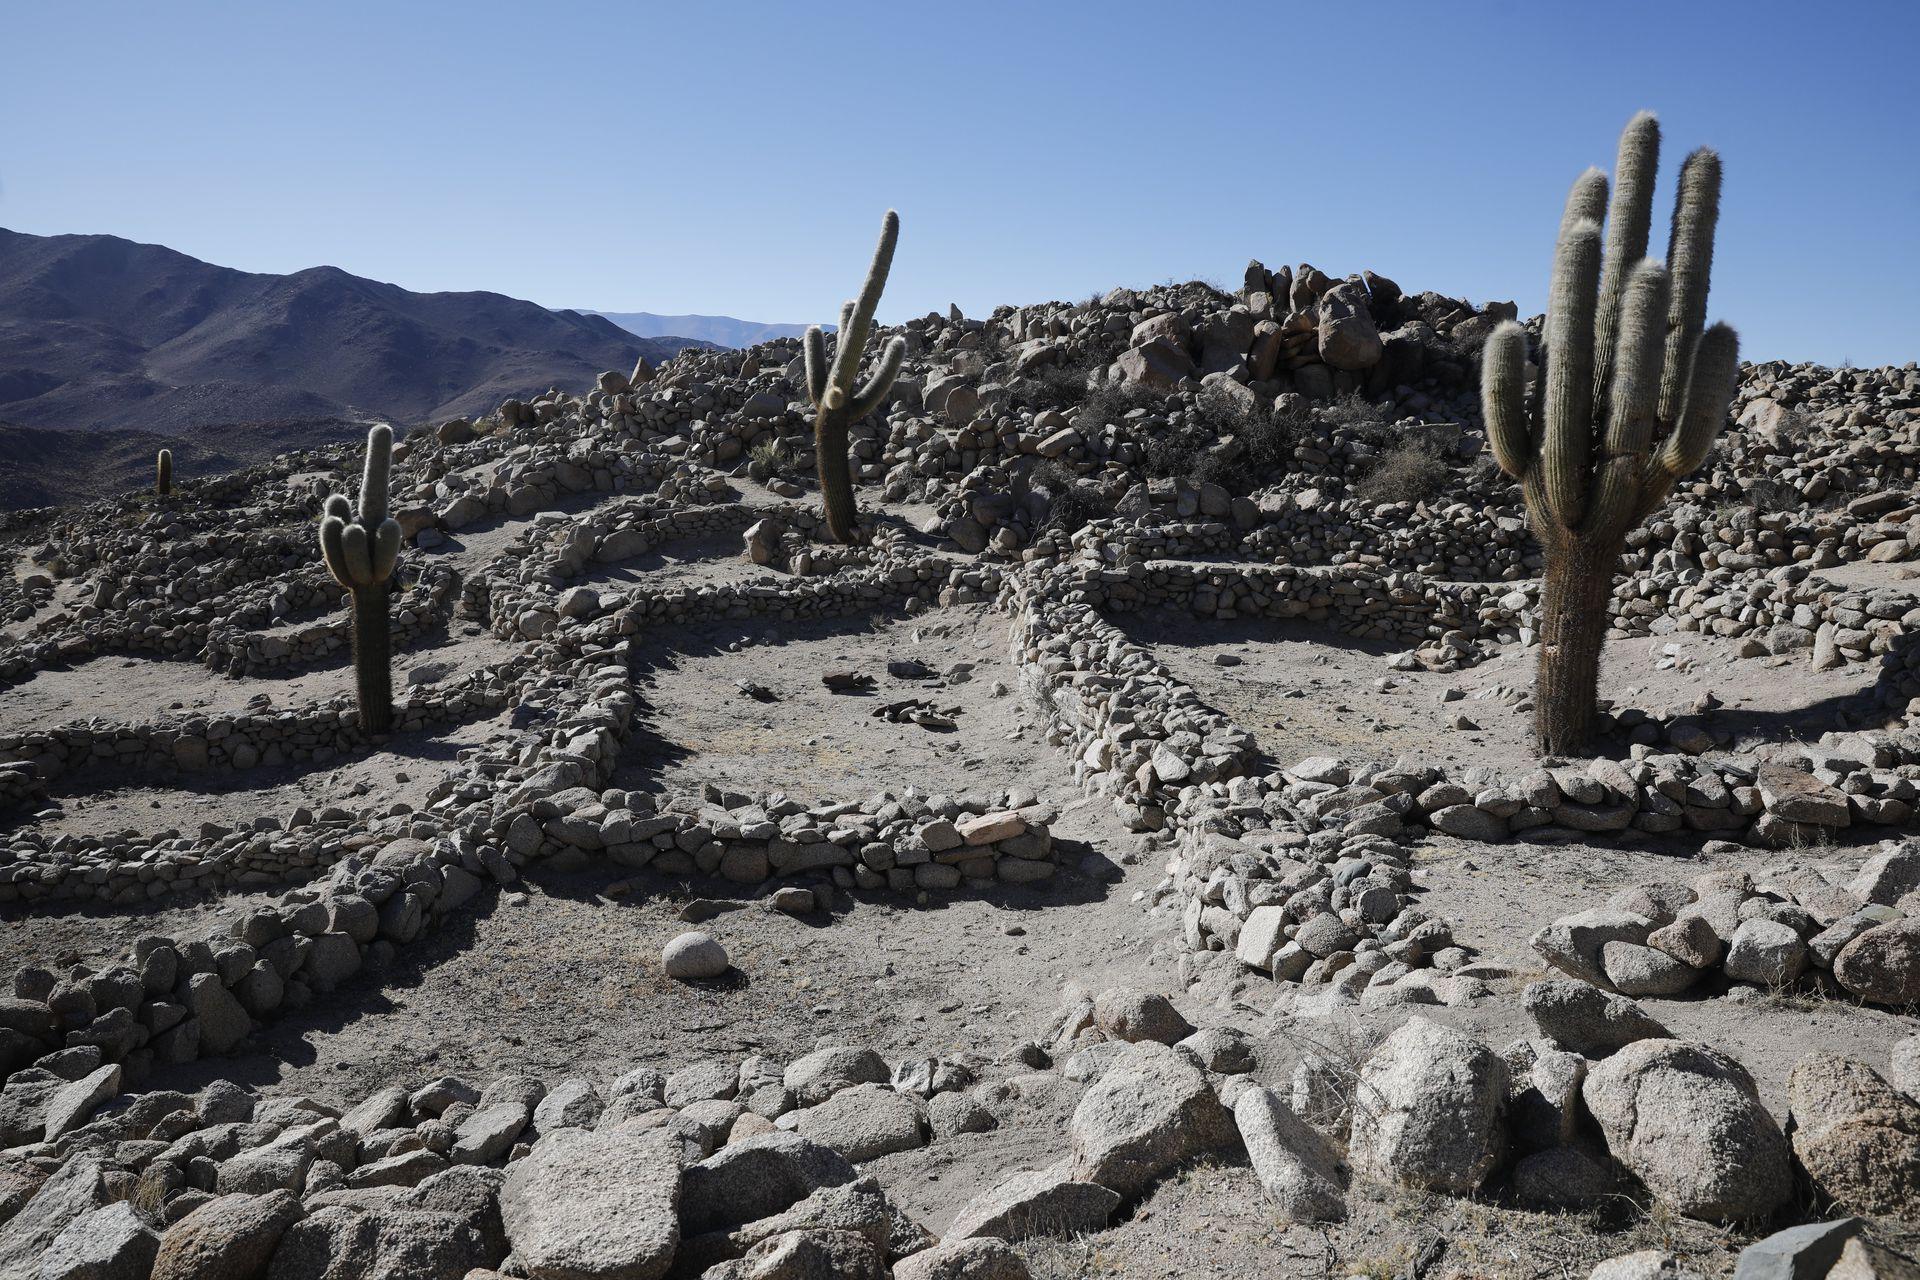 Las Ruinas de Tastil, declarada Monumento Histórico Nacional